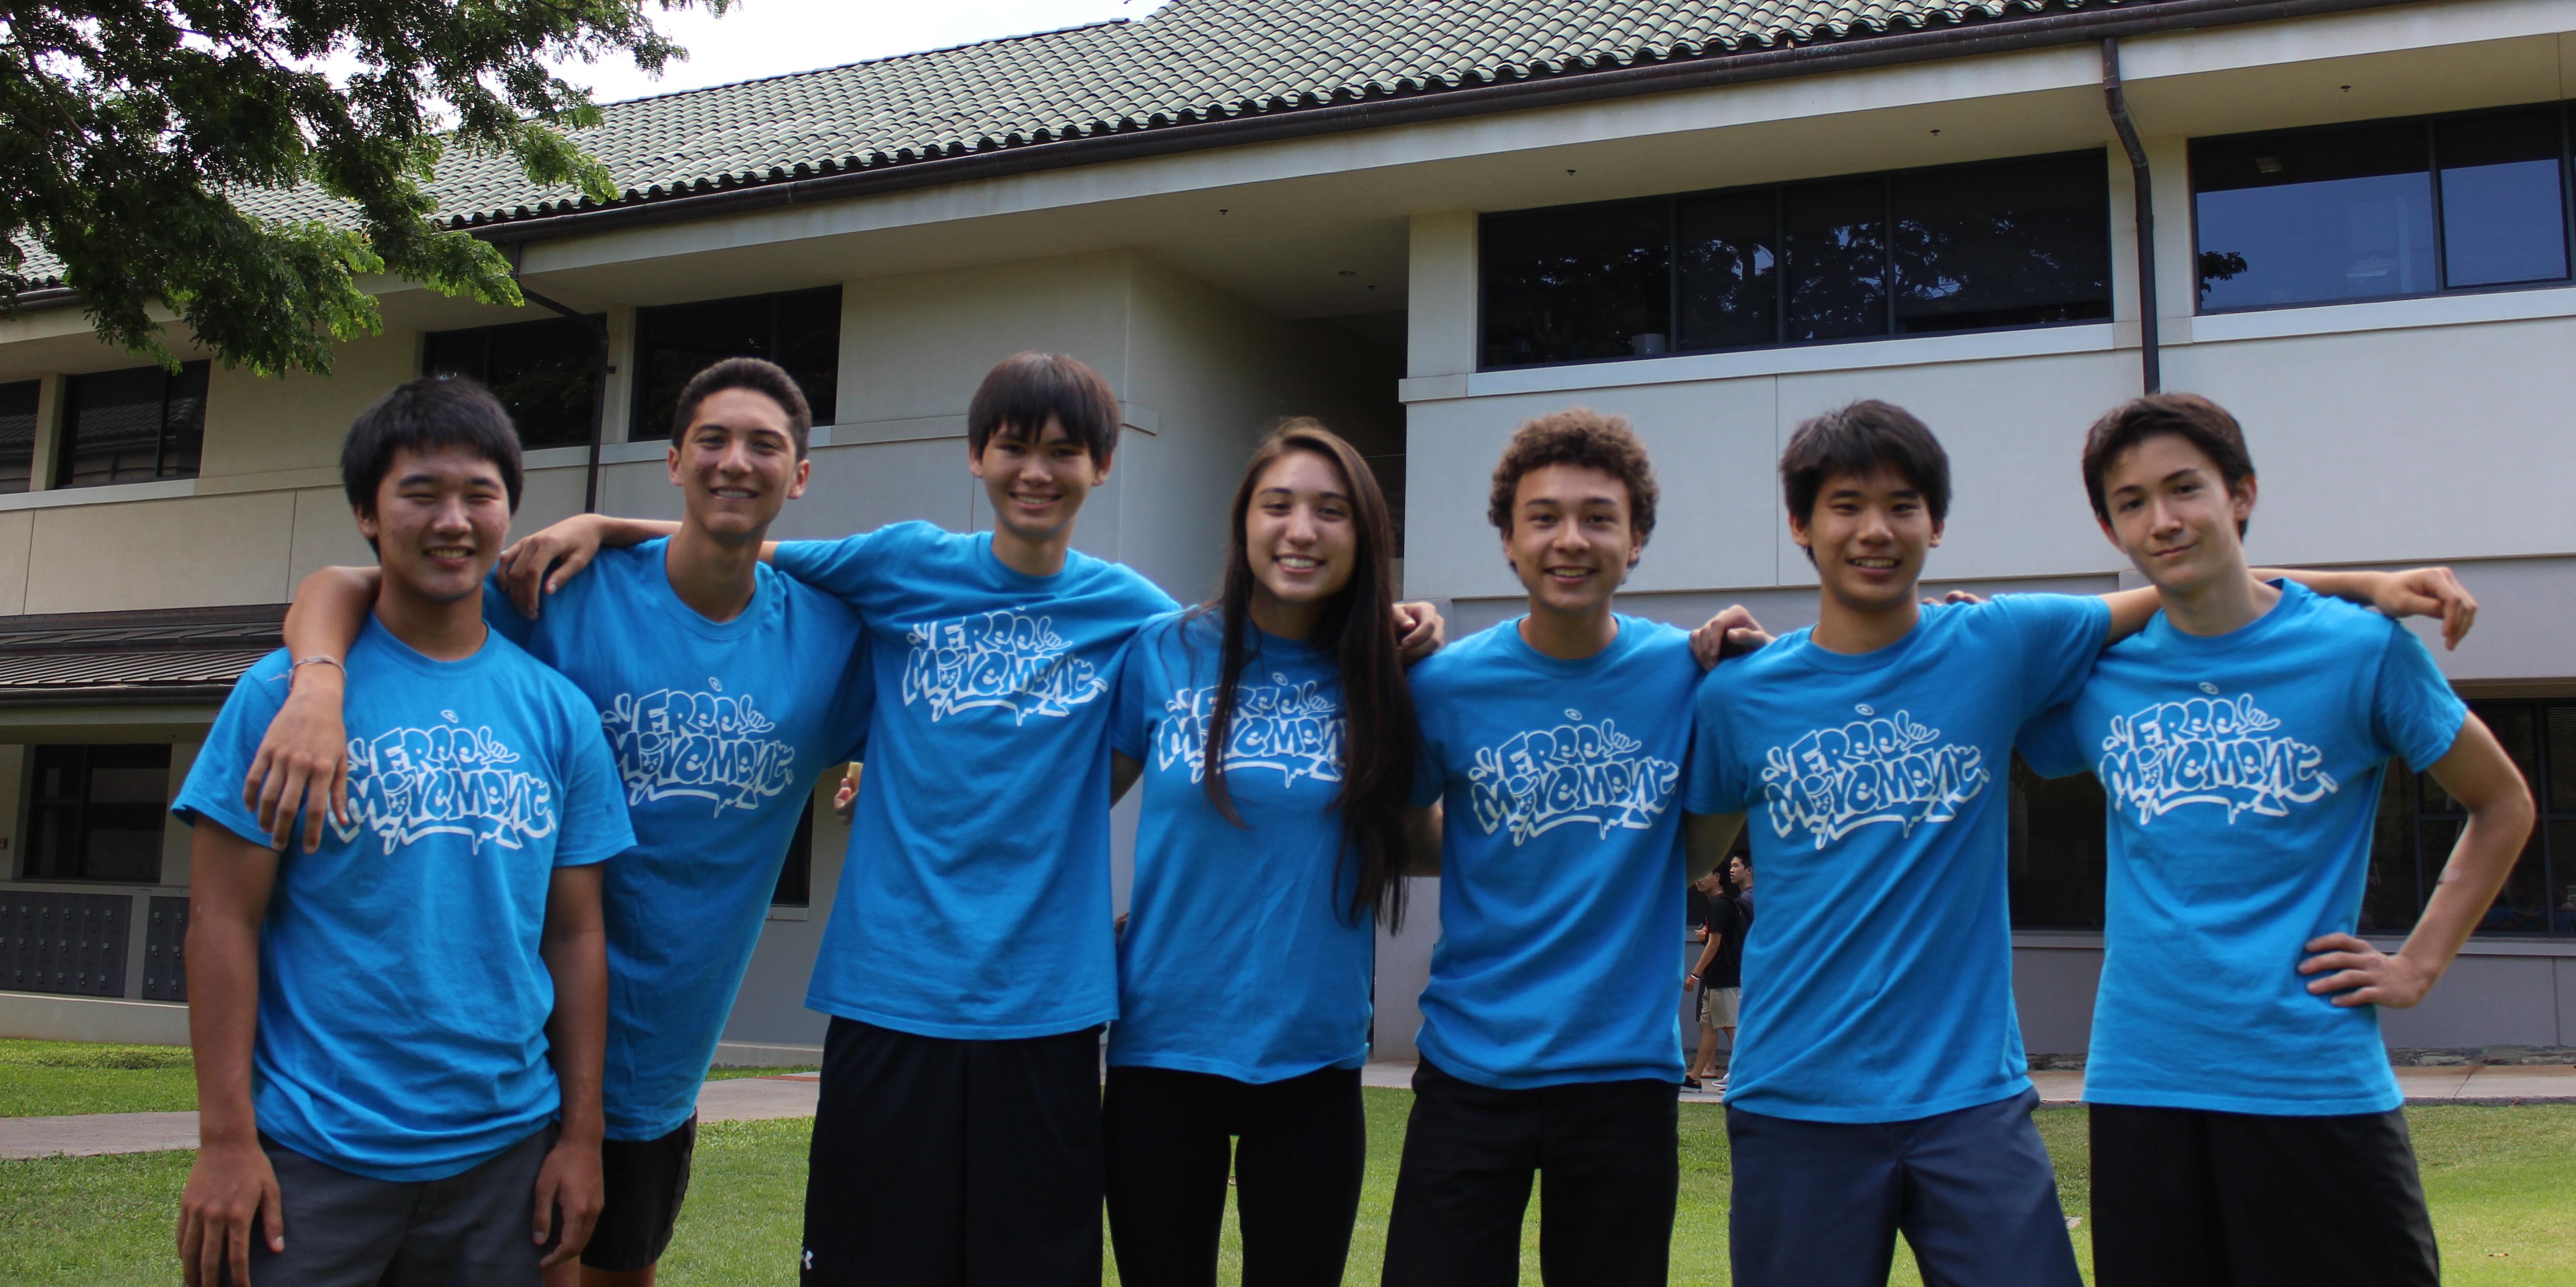 T shirt design hawaii - Hawaii Free Movement Club T Shirt Photo